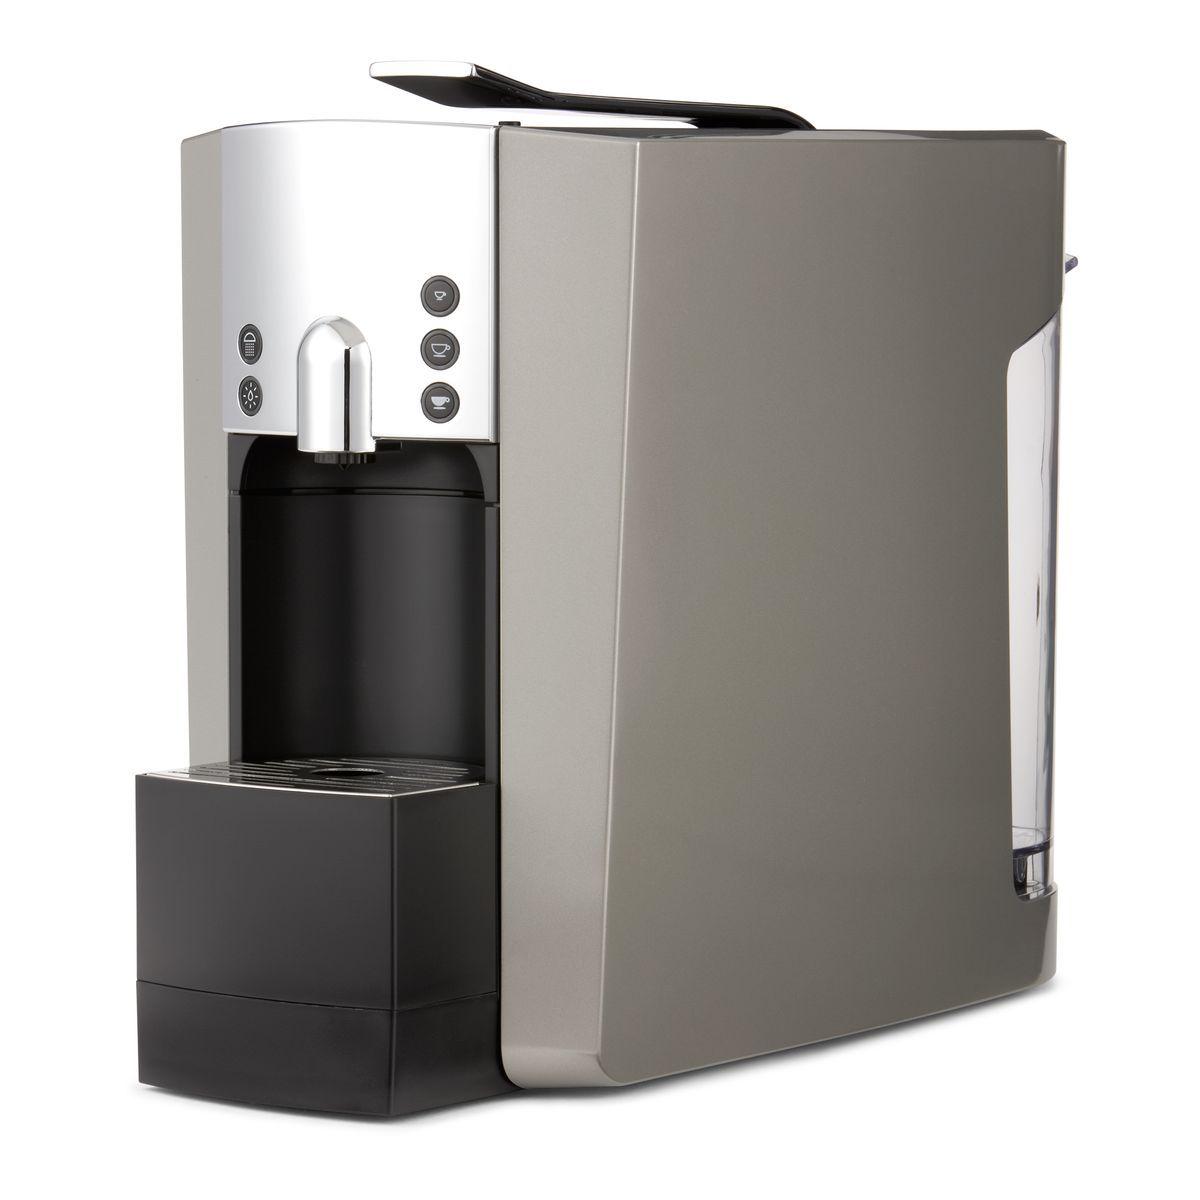 40+ Verismo coffee pods where to buy ideas